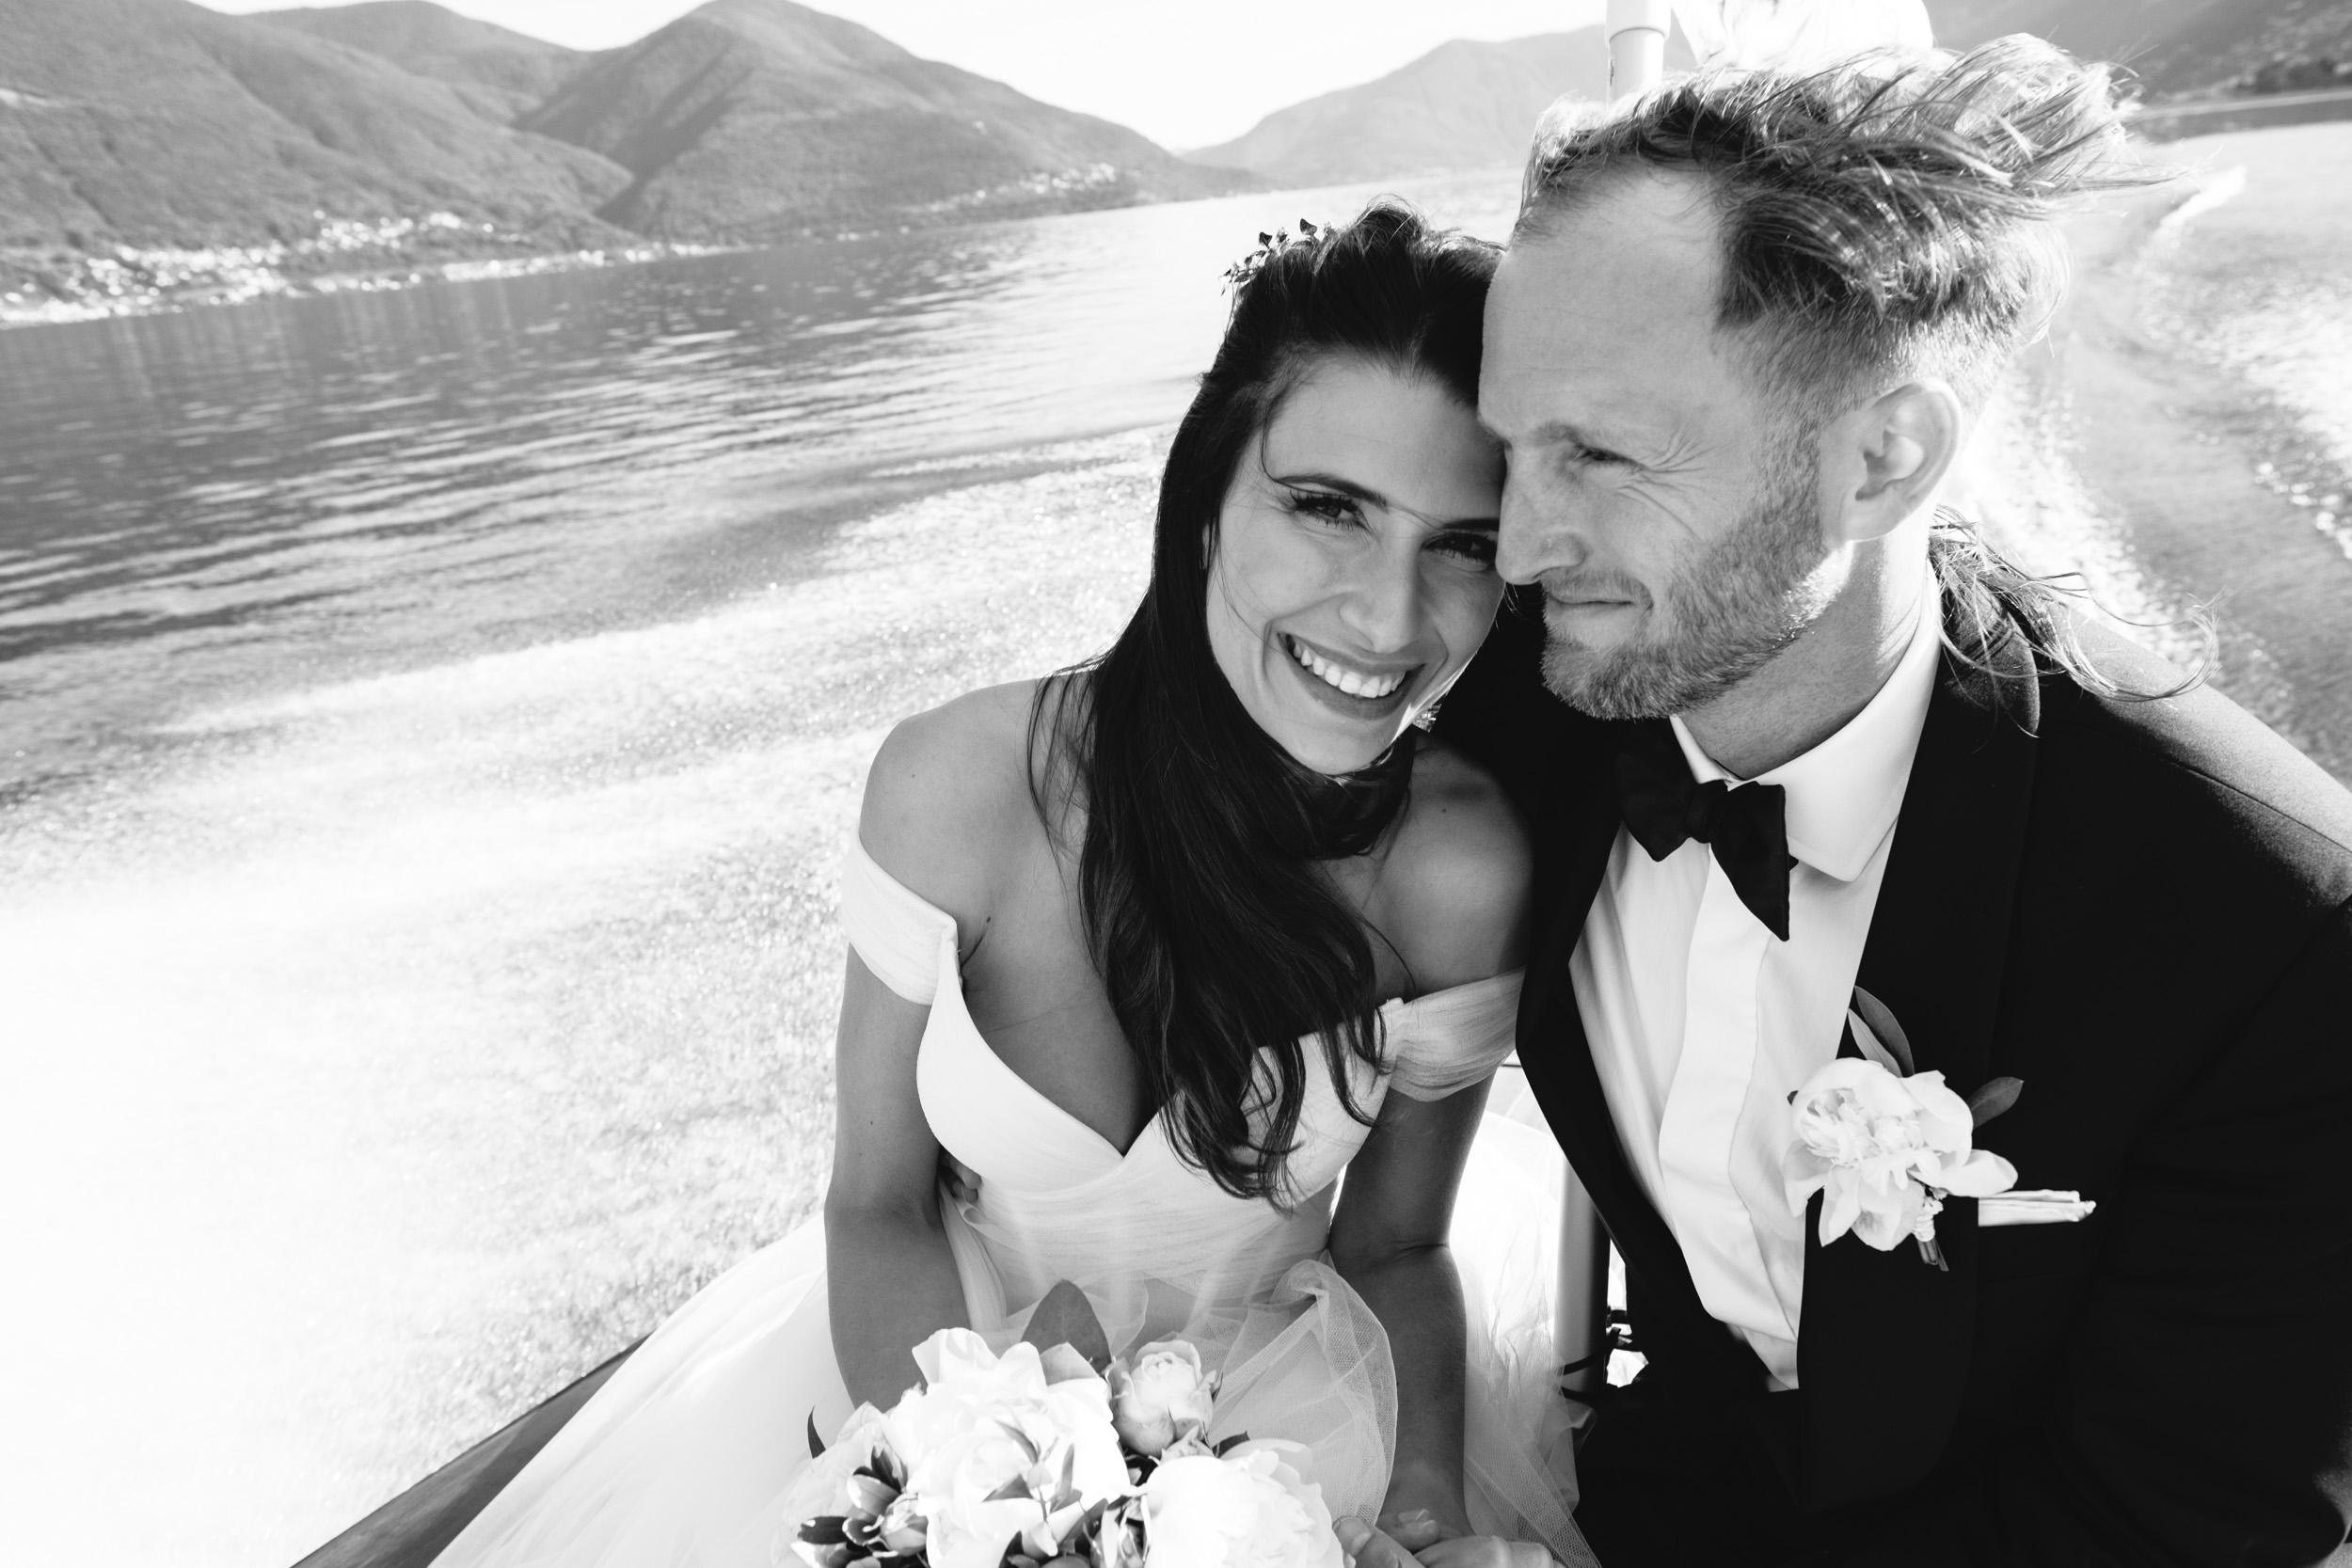 olivia-andreas-wedding-switzerland-430.jpg